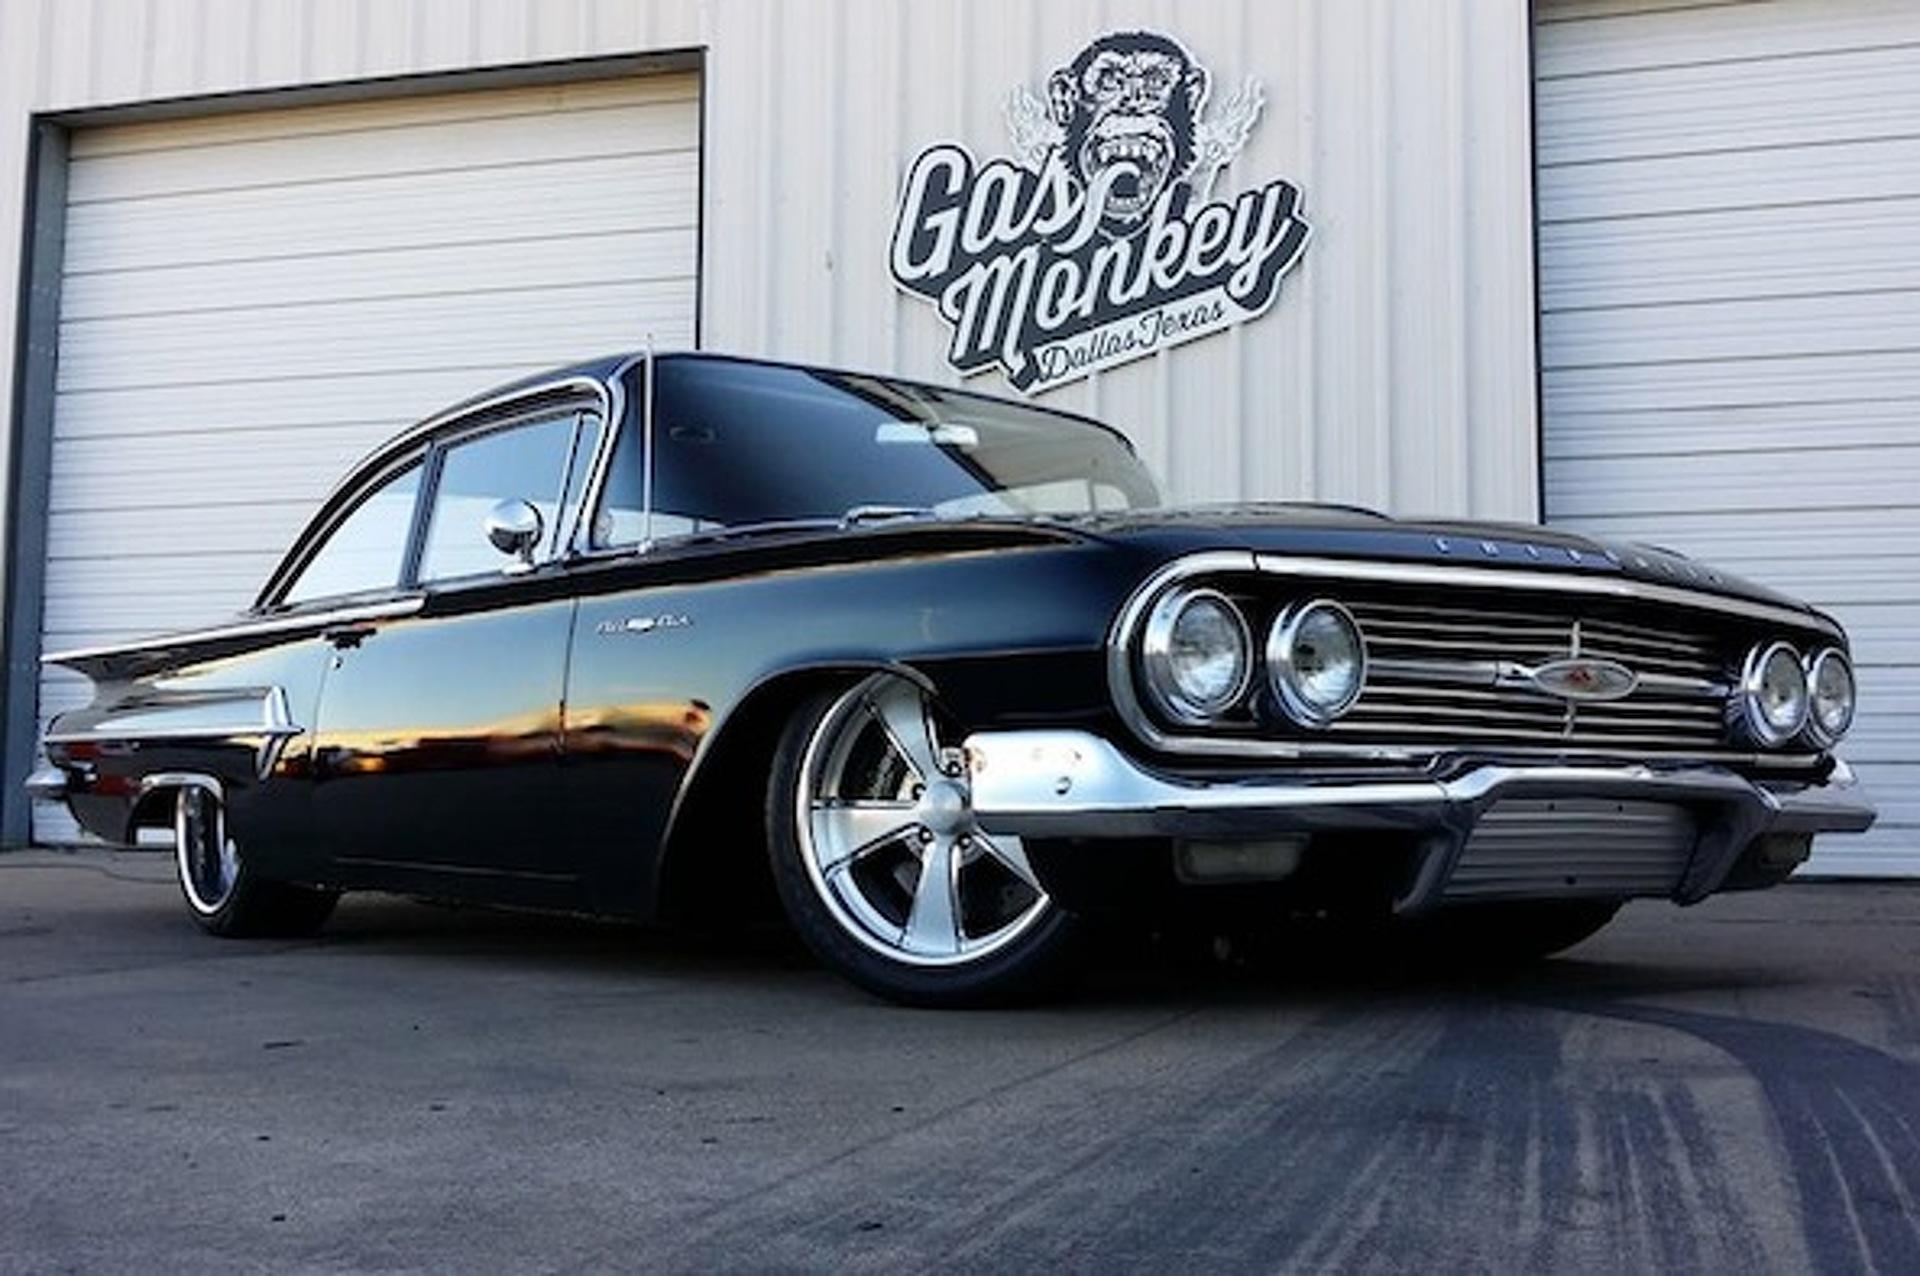 Gas Monkey Garage : Datsun z build of the week gas monkey garage youtube